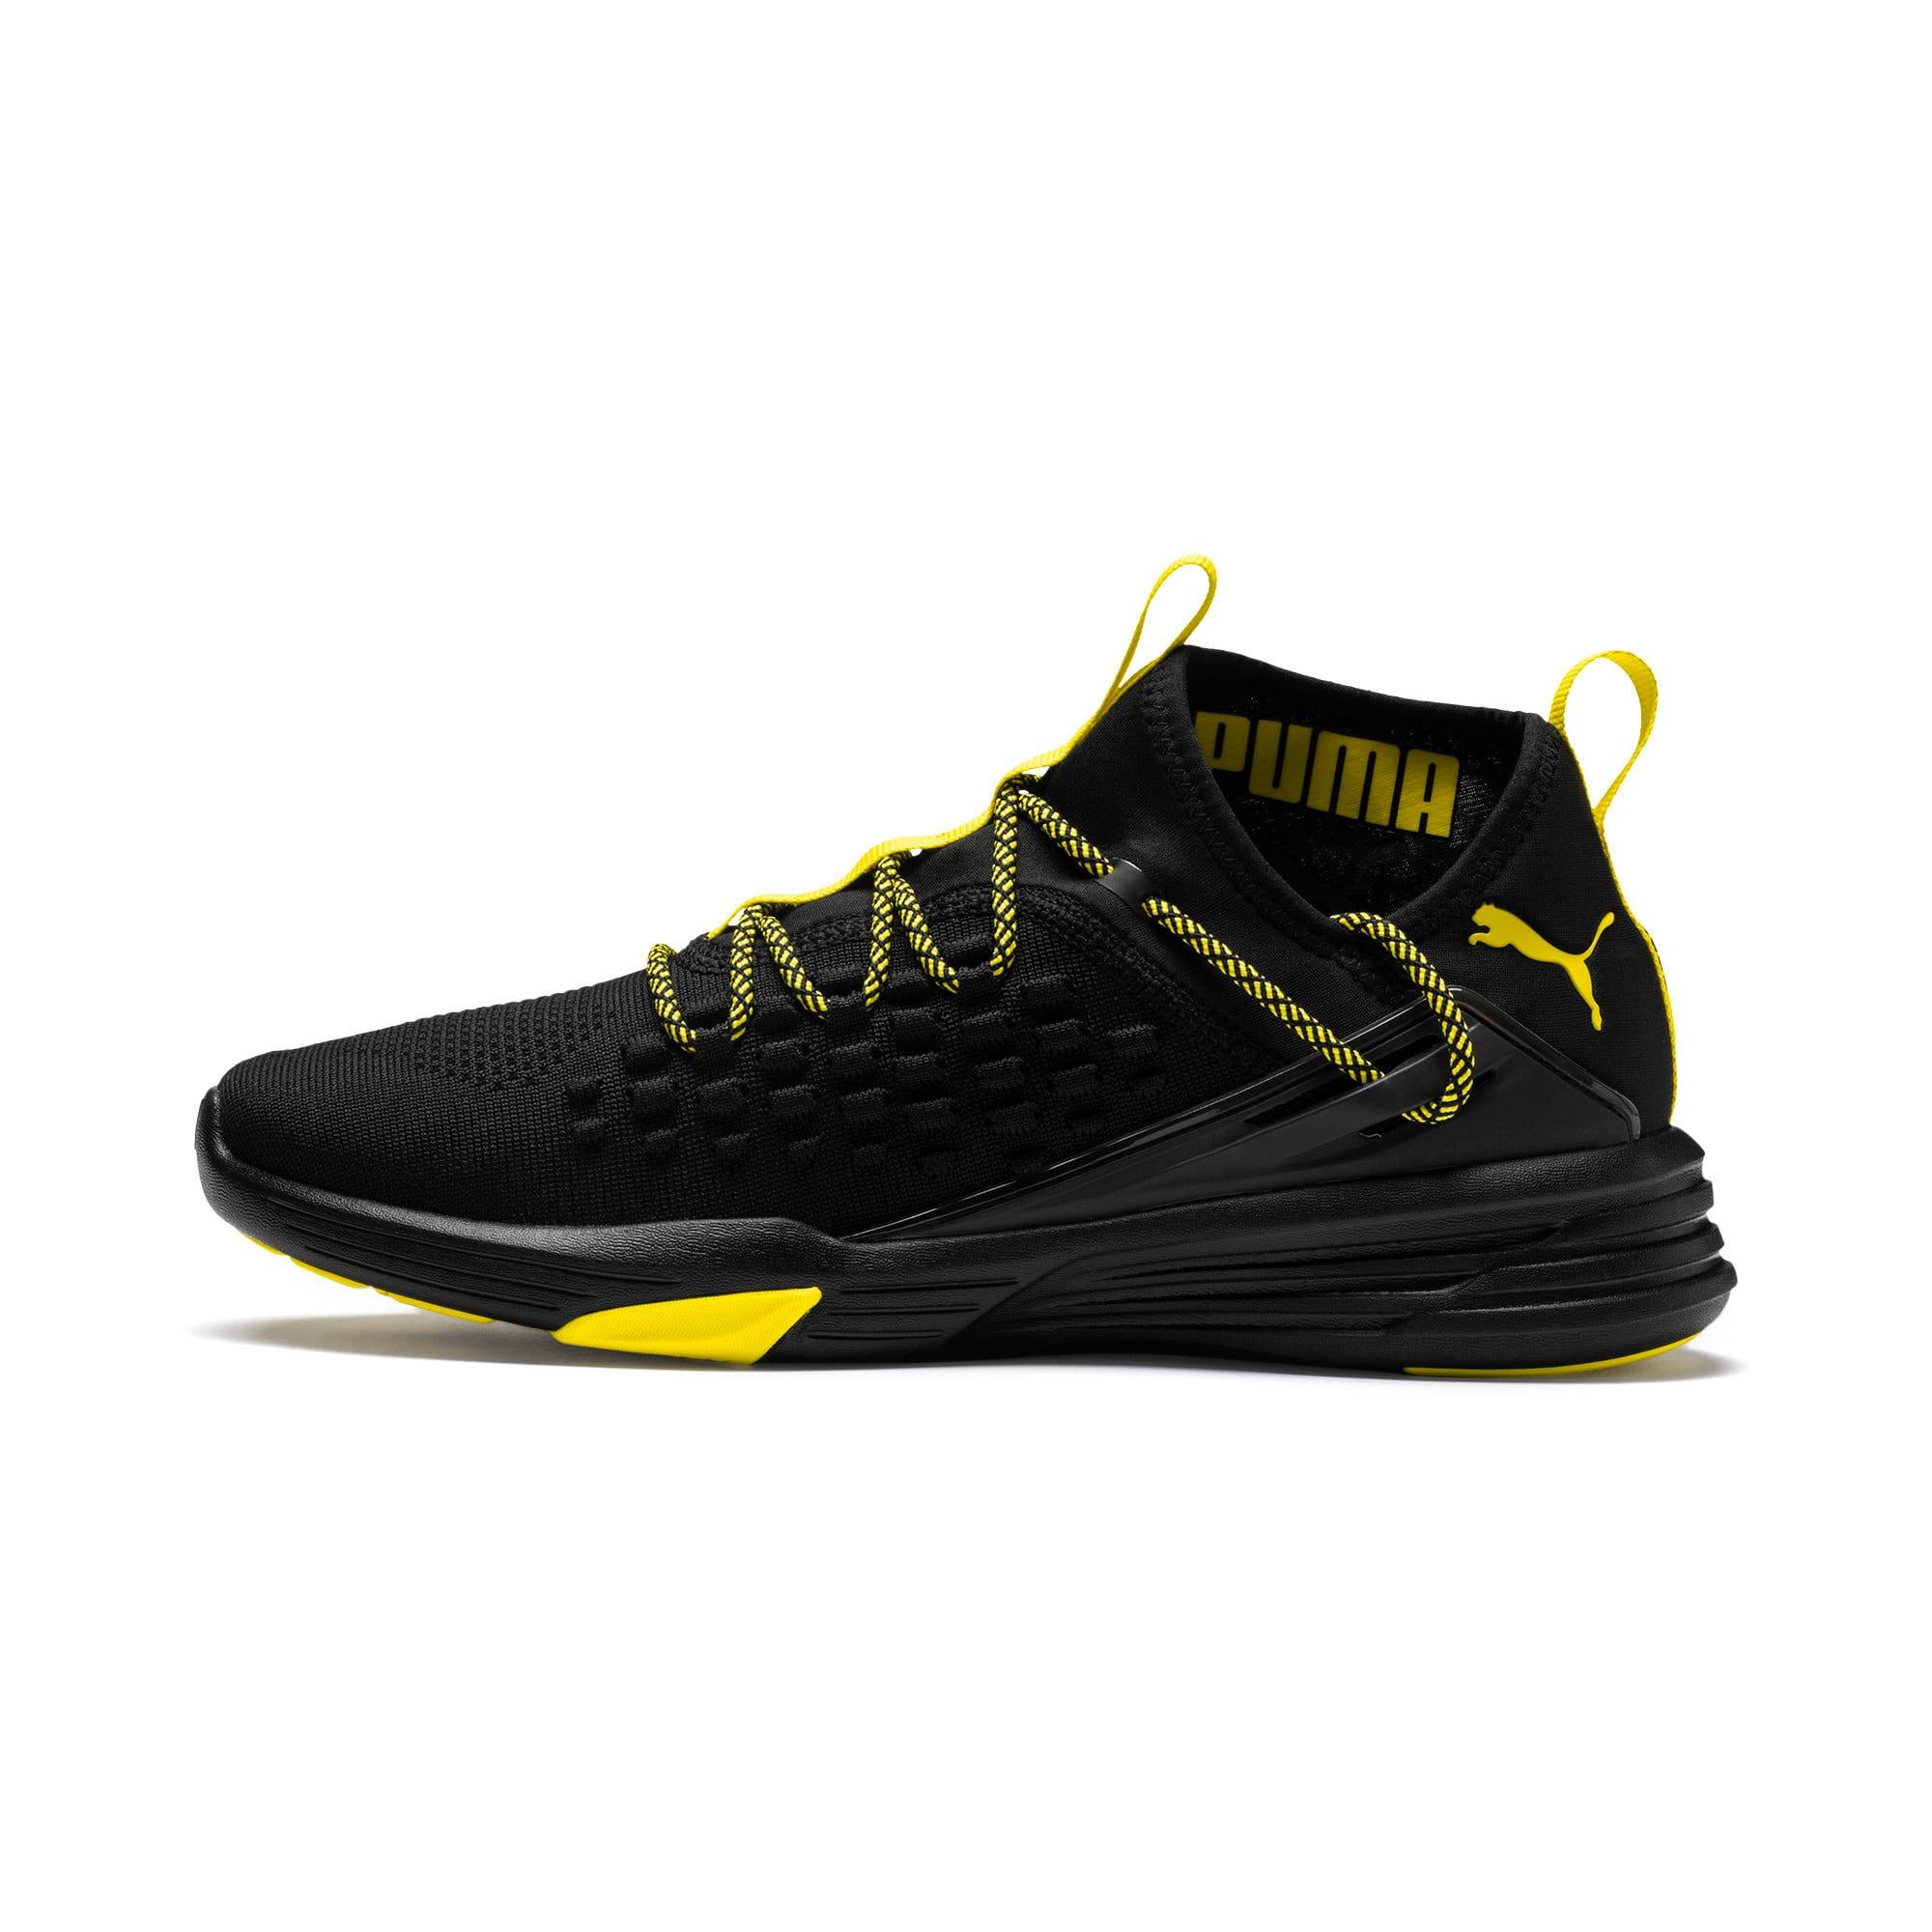 Thumbnail 1 of Mantra Caution Men's Training Shoes, Puma Black-Blazing Yellow, medium